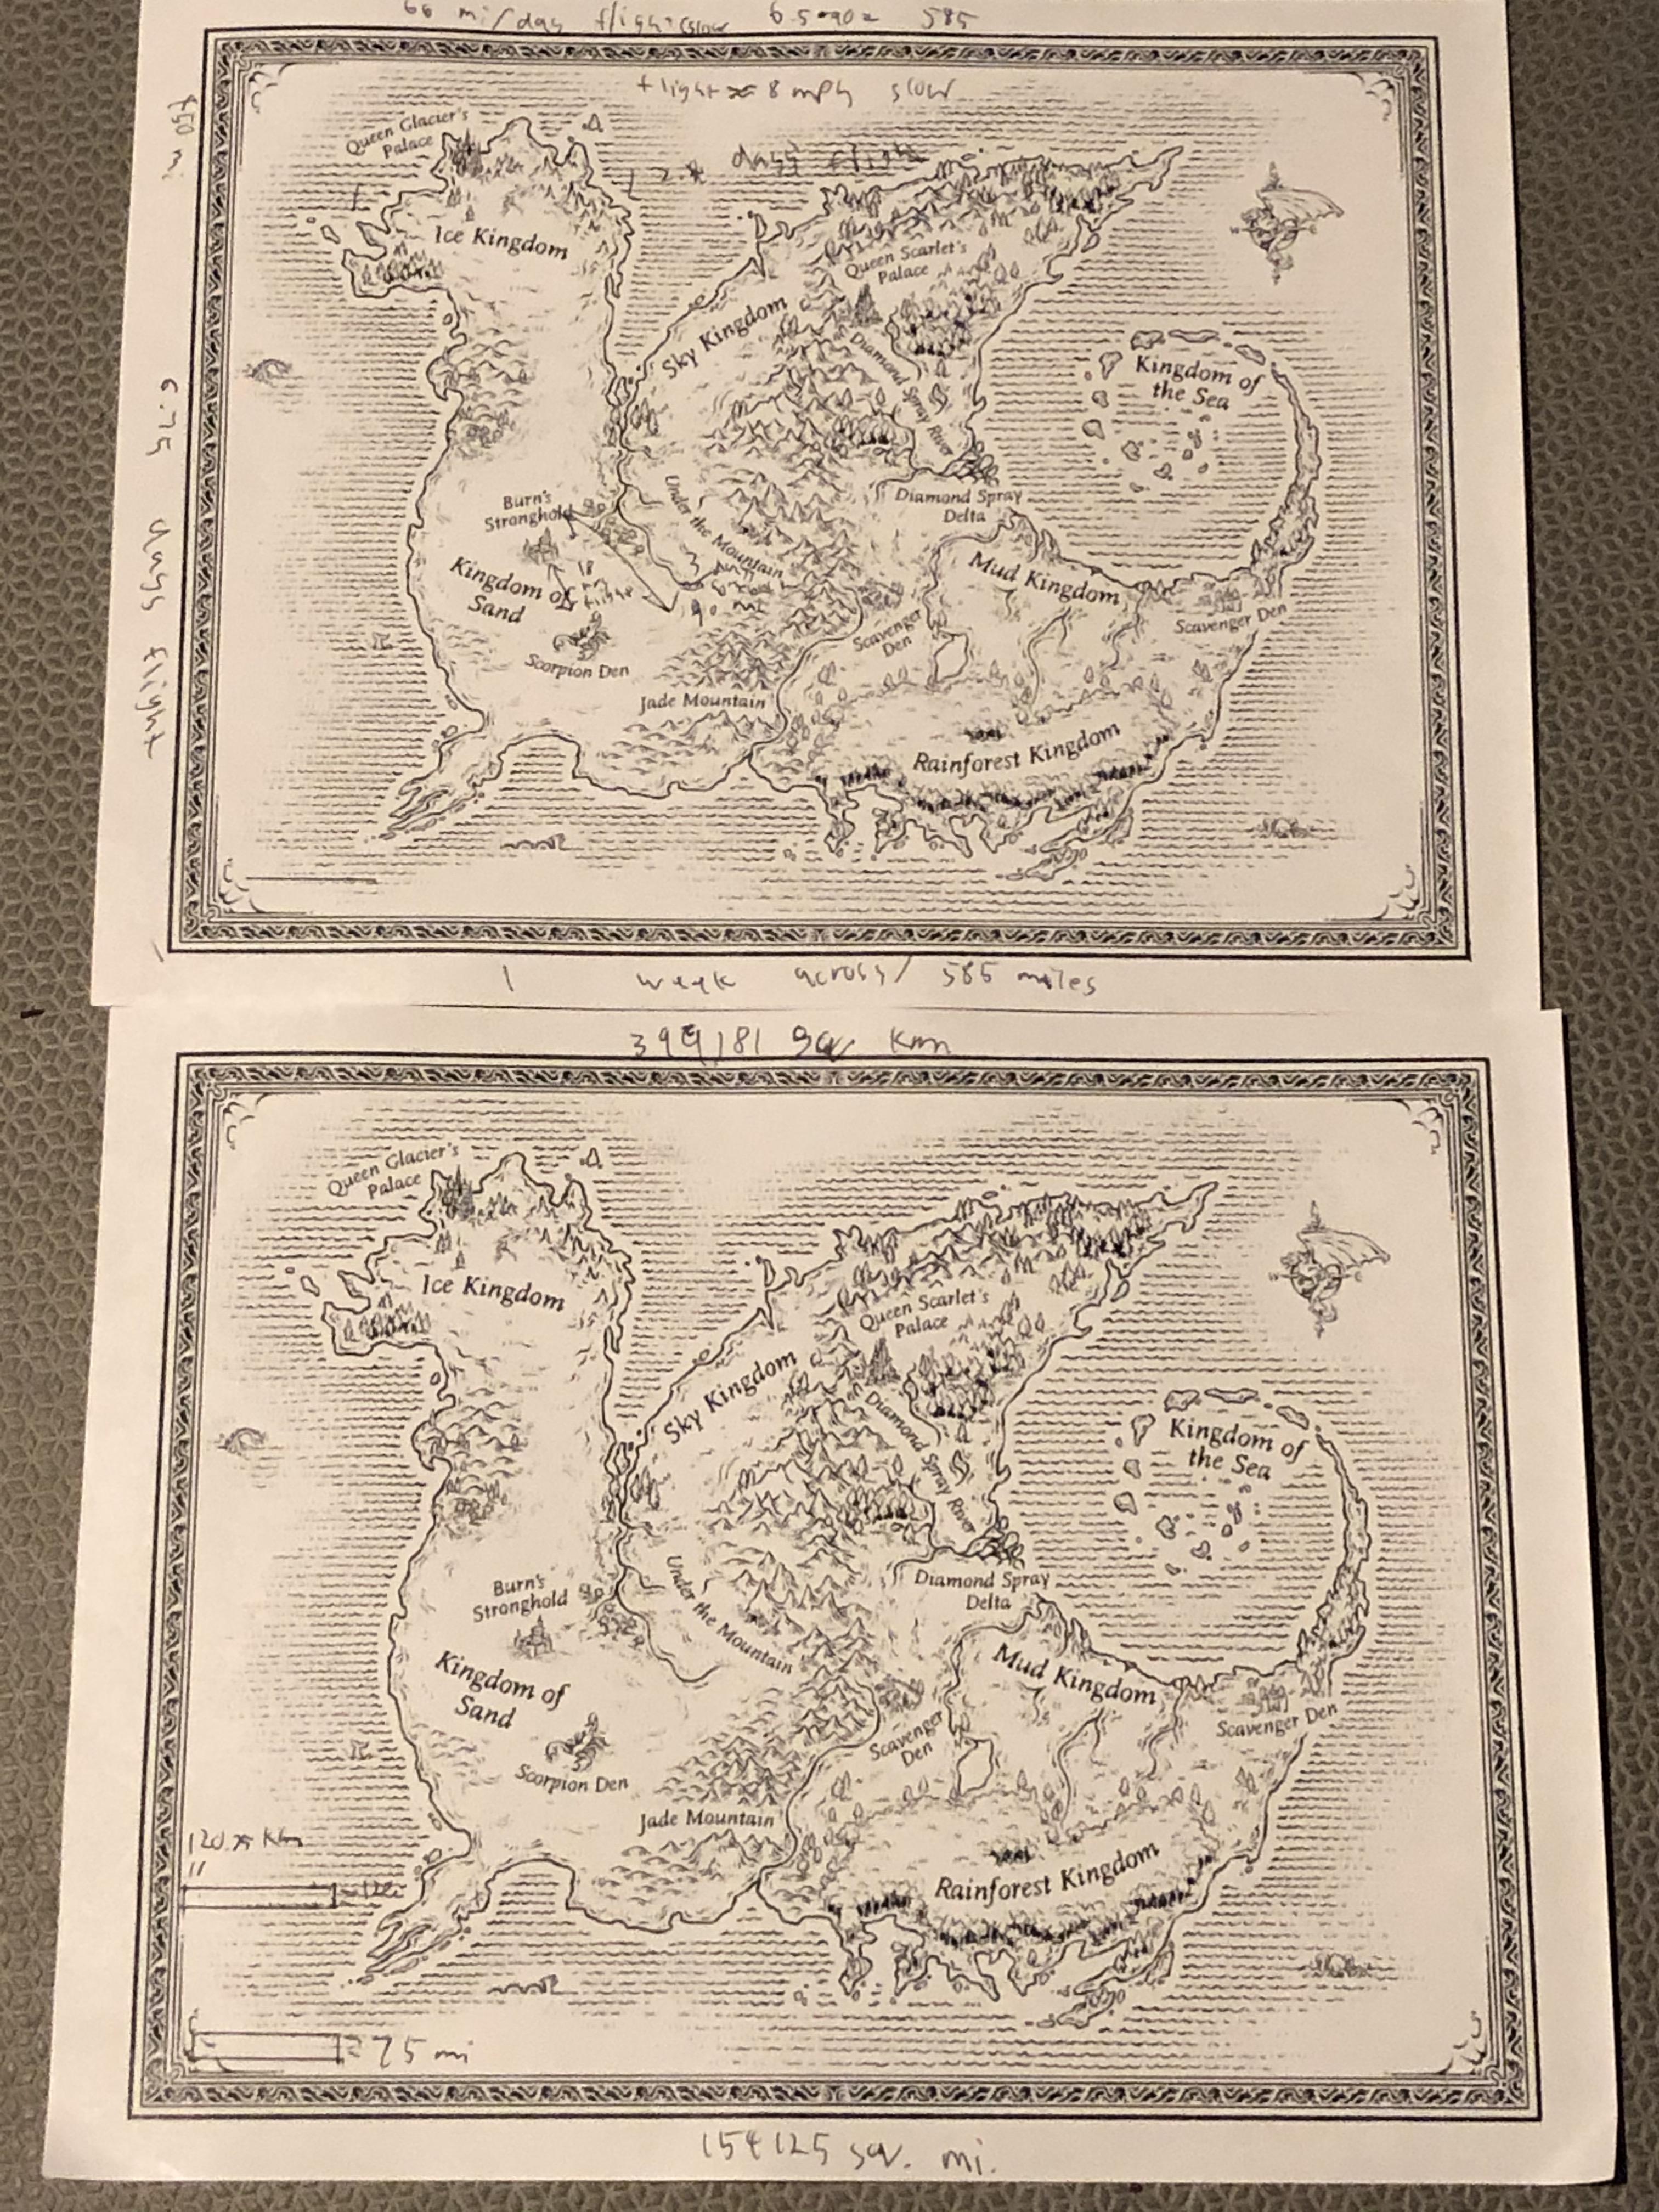 Wings Of Fire Map Of Pyrrhia : wings, pyrrhia, Pyrrhia:, Measured, Miles, Using, Books, Canon, Measurements., WingsOfFire